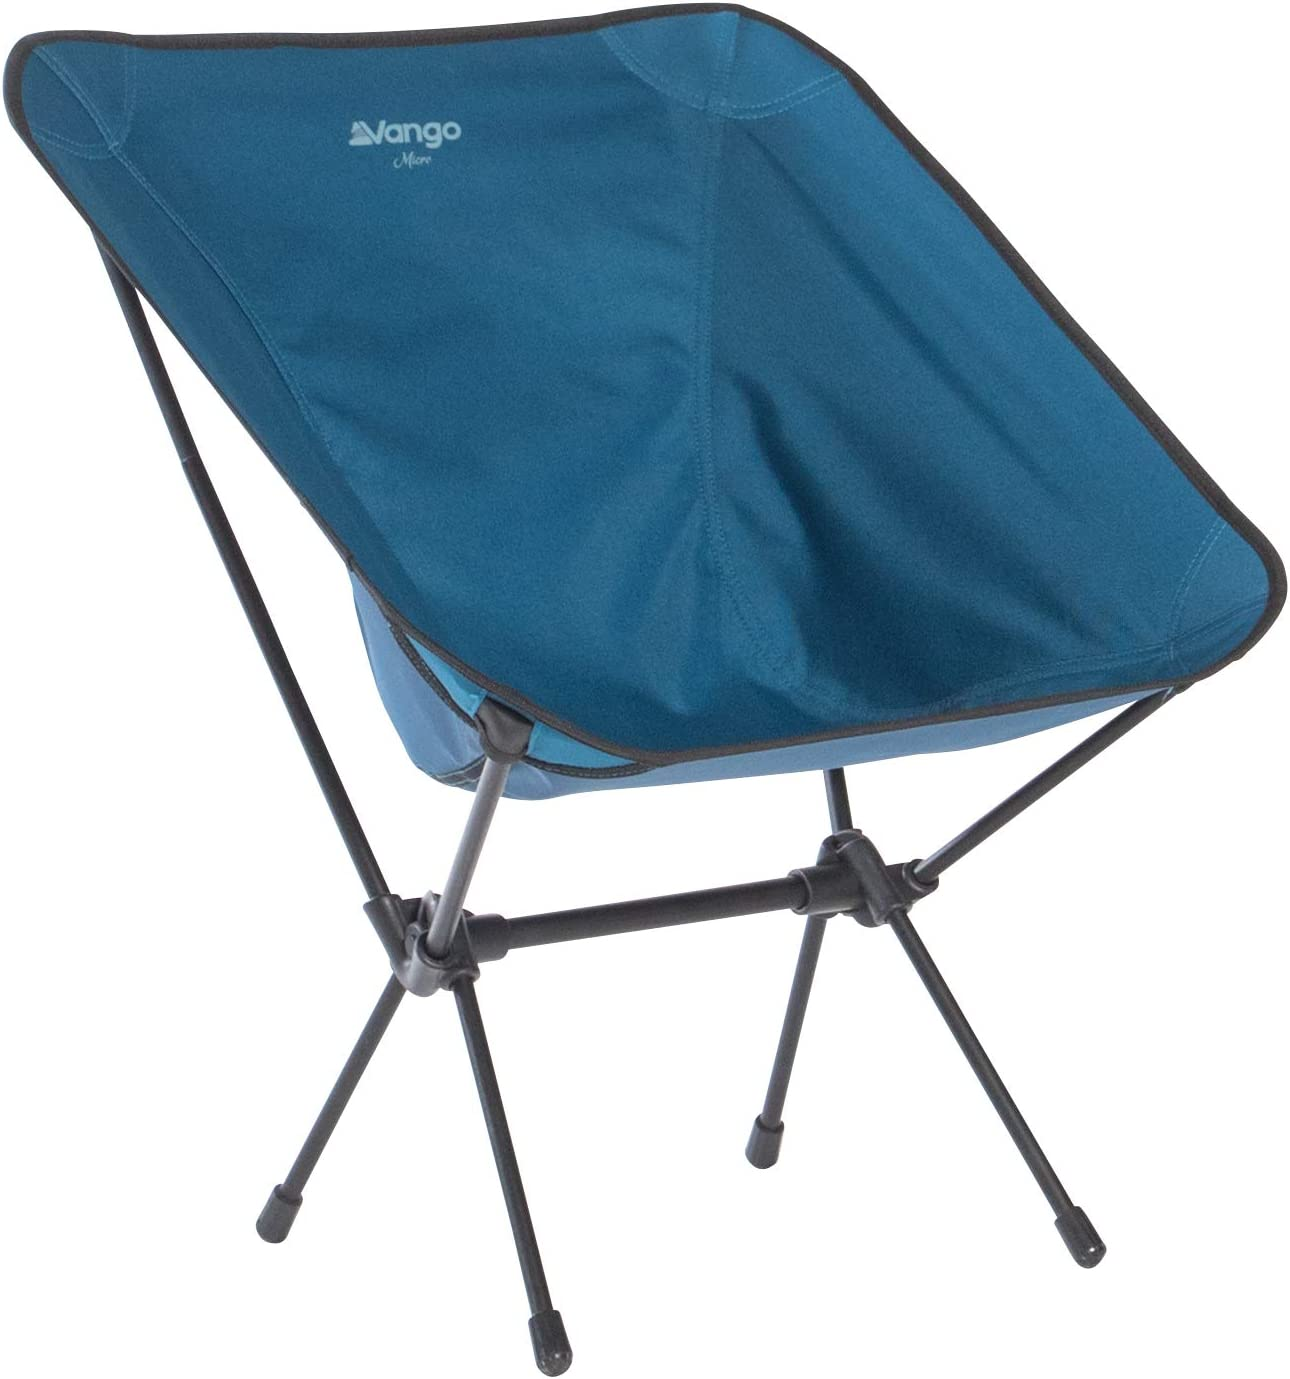 Vango Micro Steel Chair